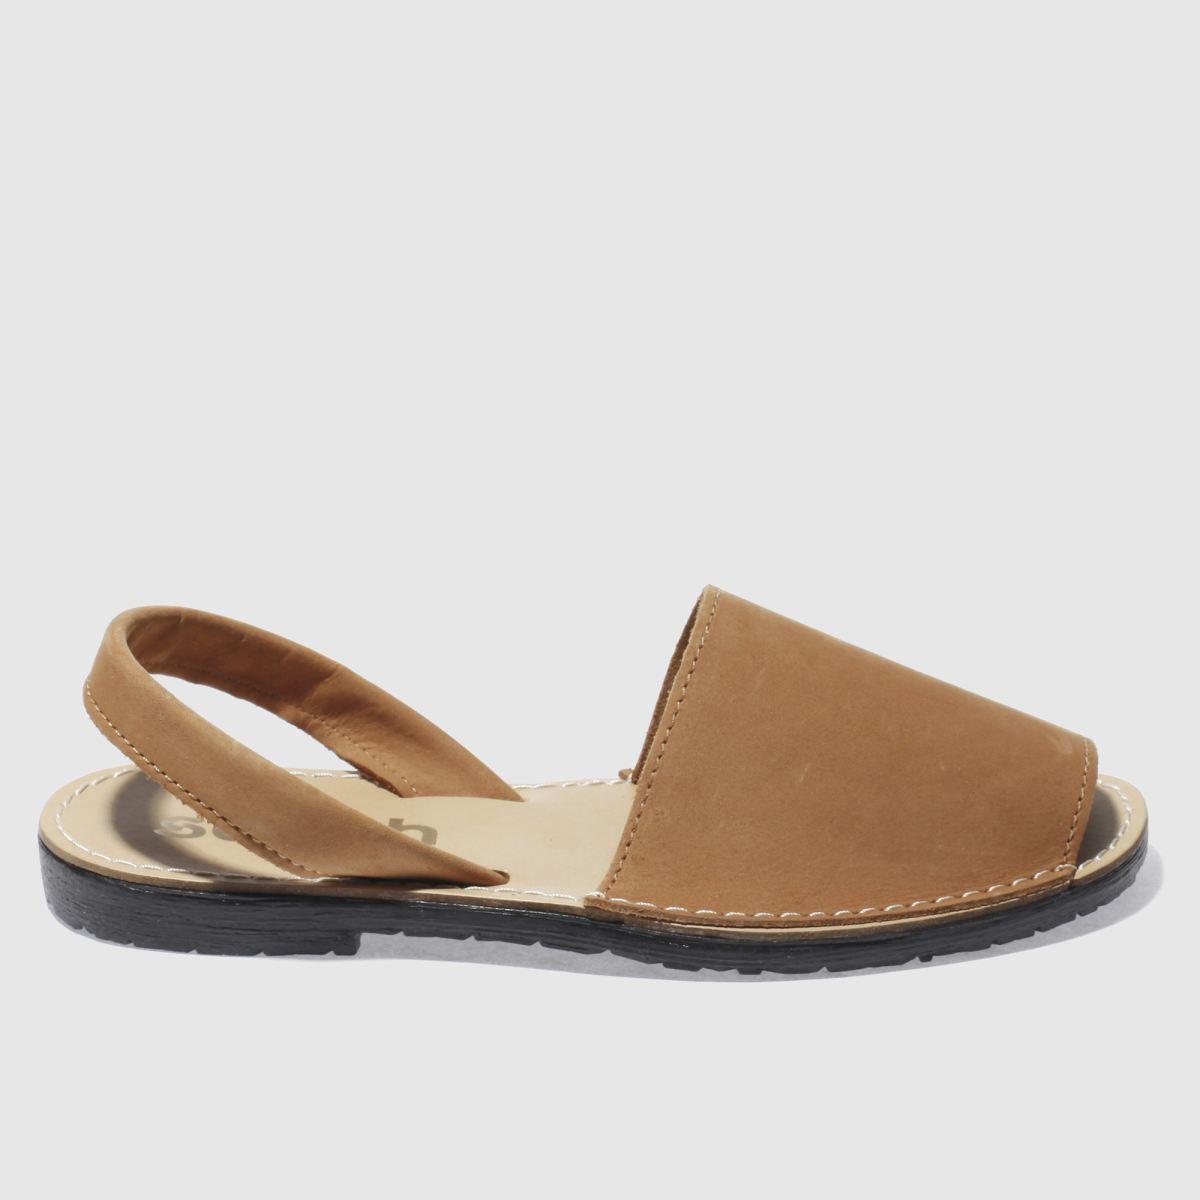 schuh tan barcelona sandals